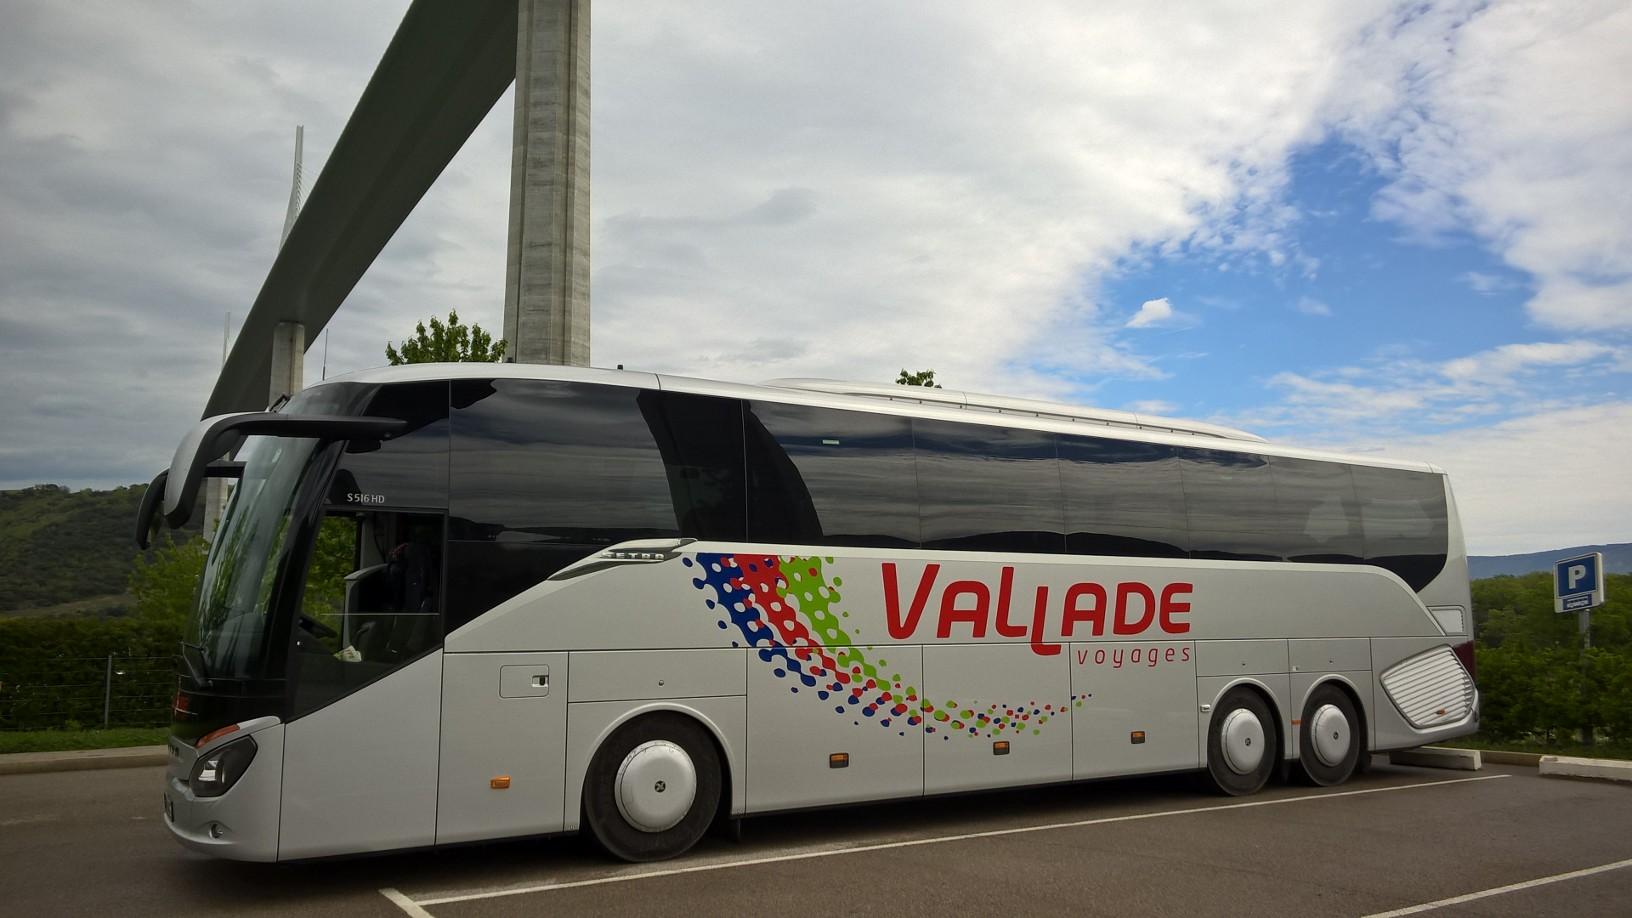 voyages vallade location bus minibus brantome. Black Bedroom Furniture Sets. Home Design Ideas